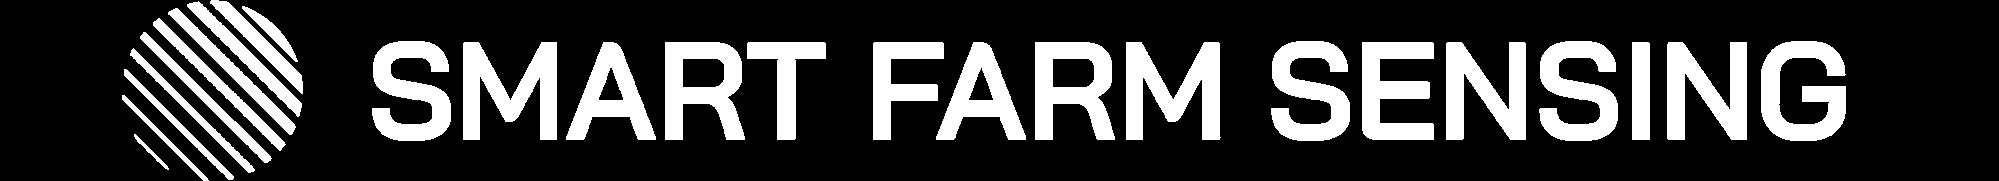 Smart Farm Sensing